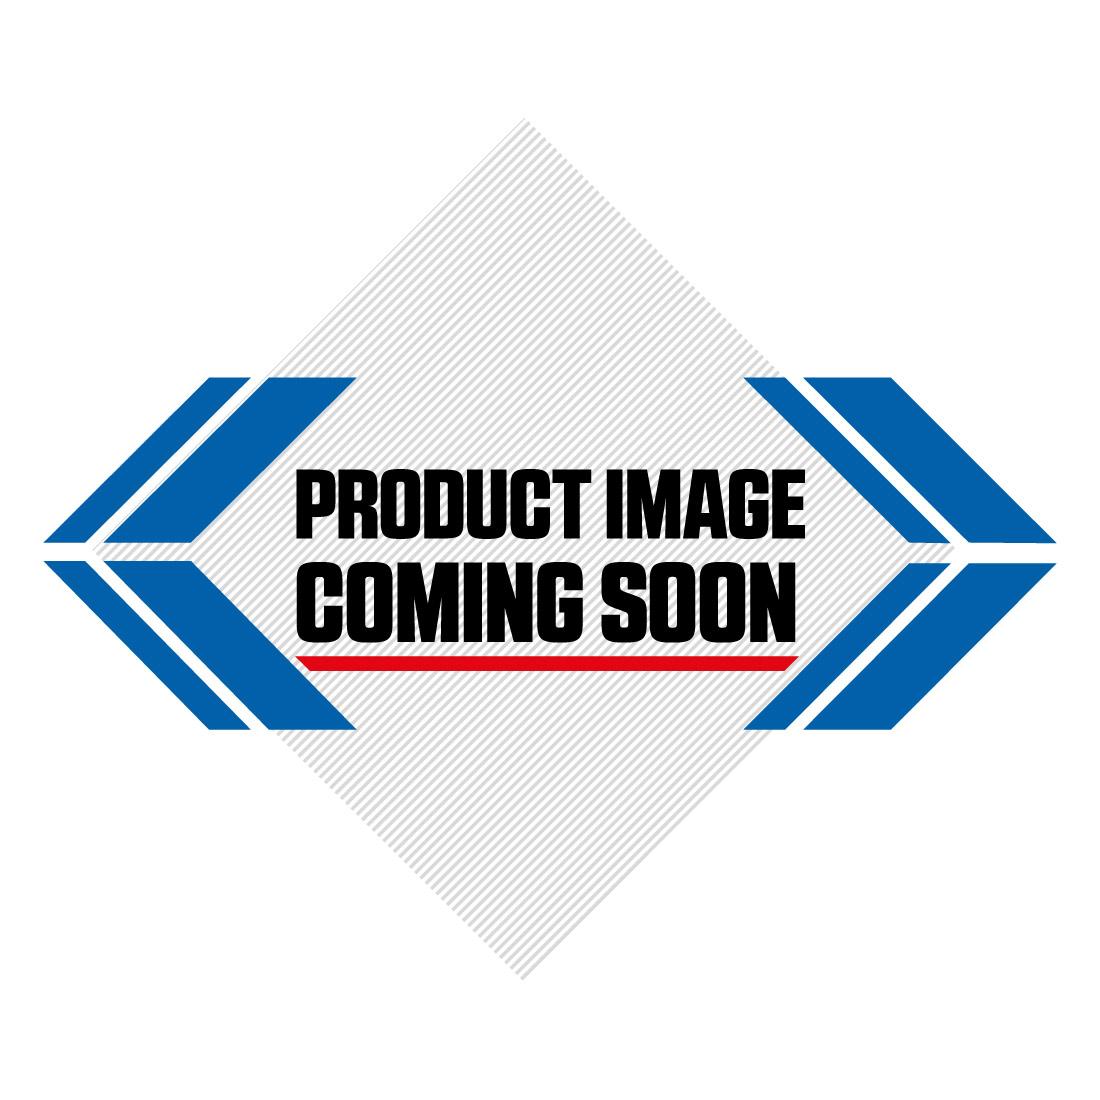 Suzuki Plastic Kit RMZ 450 (2013) OEM Factory Image-5>